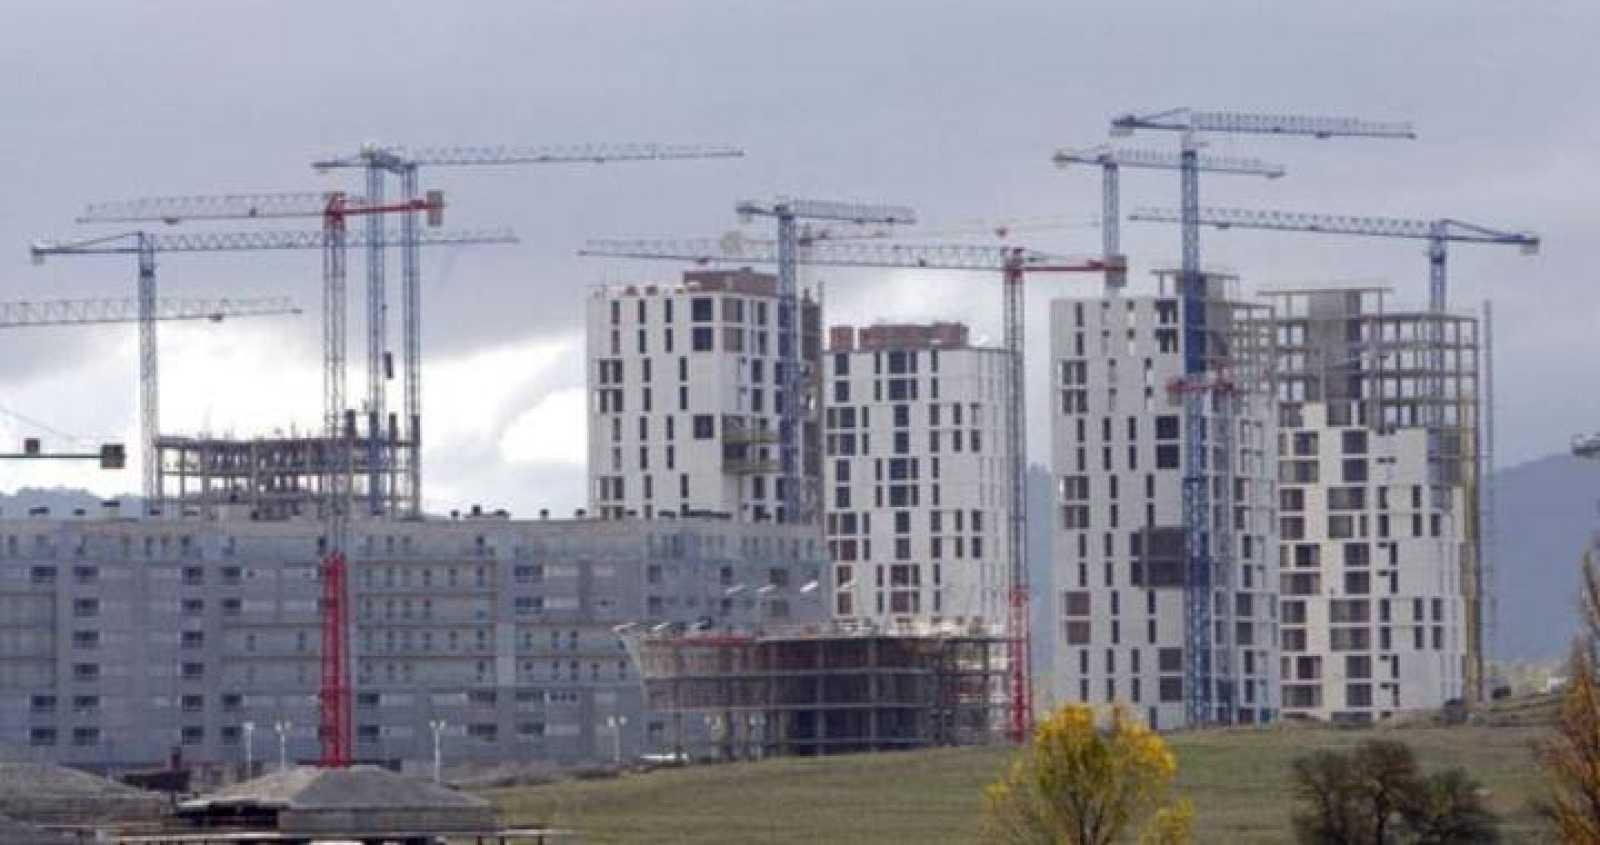 Obras en marcha de bloques de viviendas